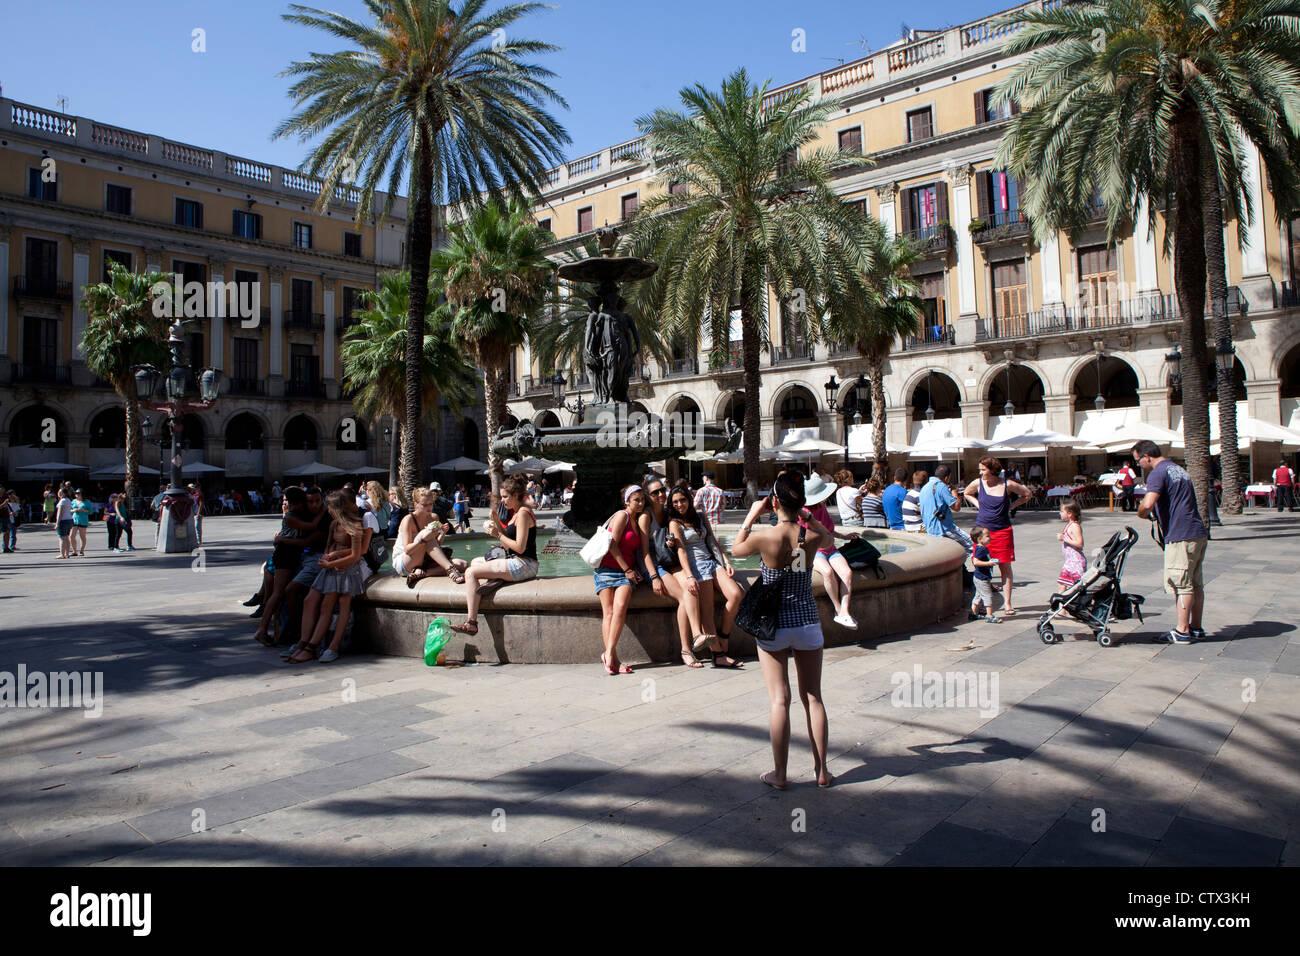 Placa Reial Barcelona Spain - Stock Image